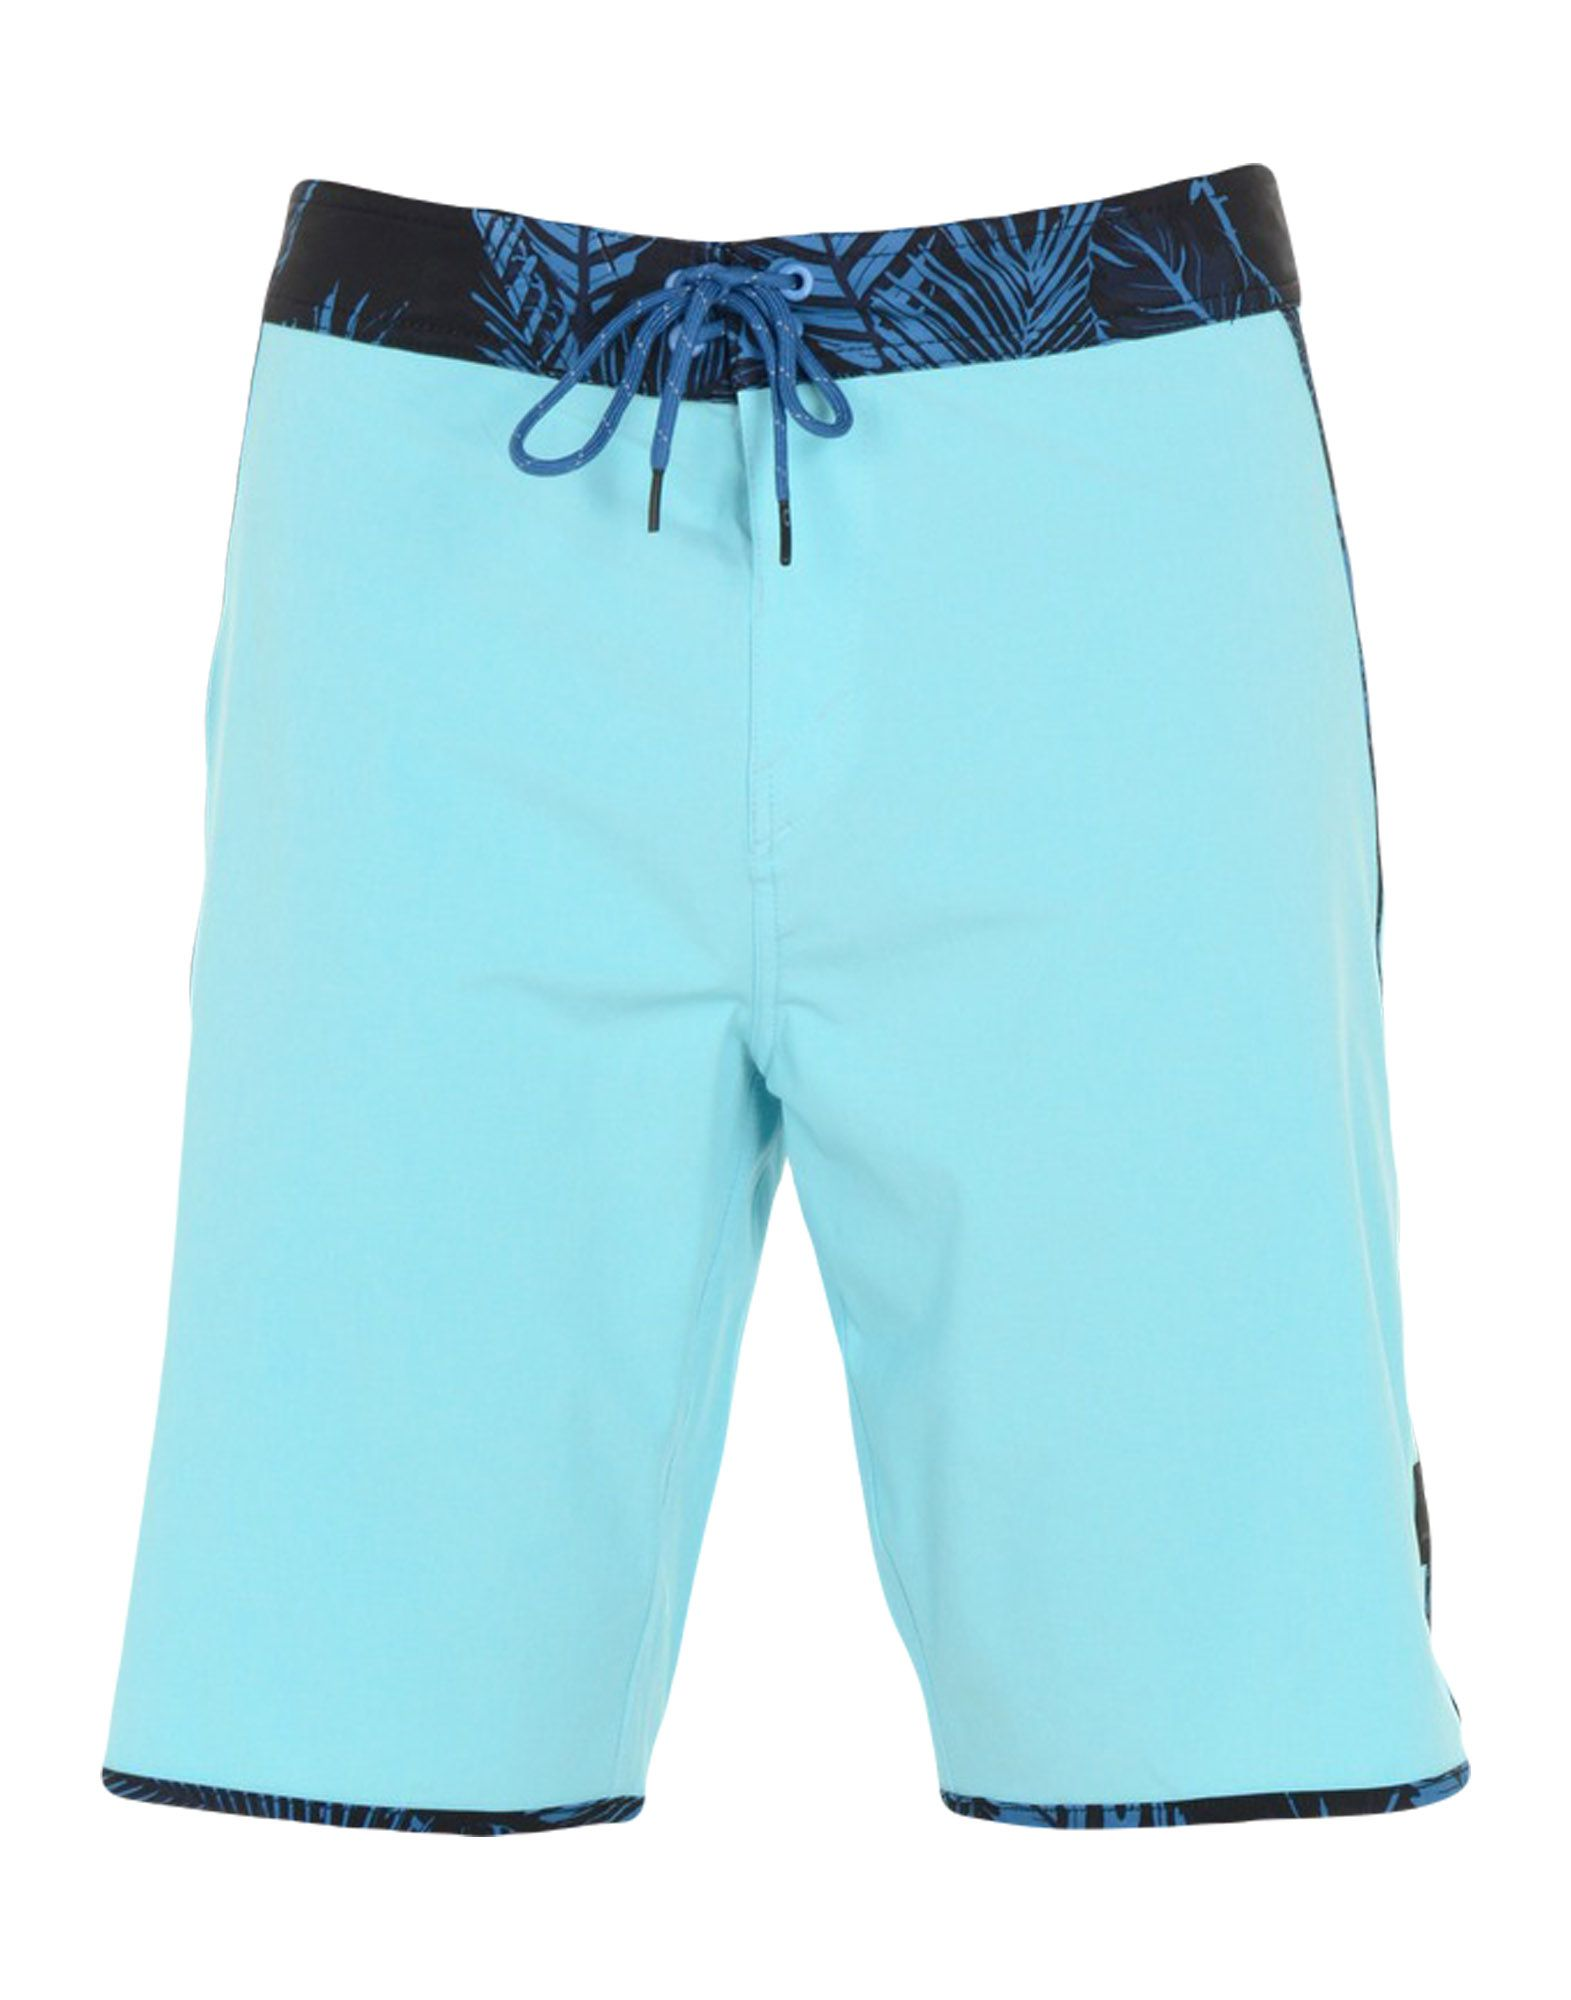 OAKLEY Пляжные брюки и шорты шорты классические женские oakley pch short white